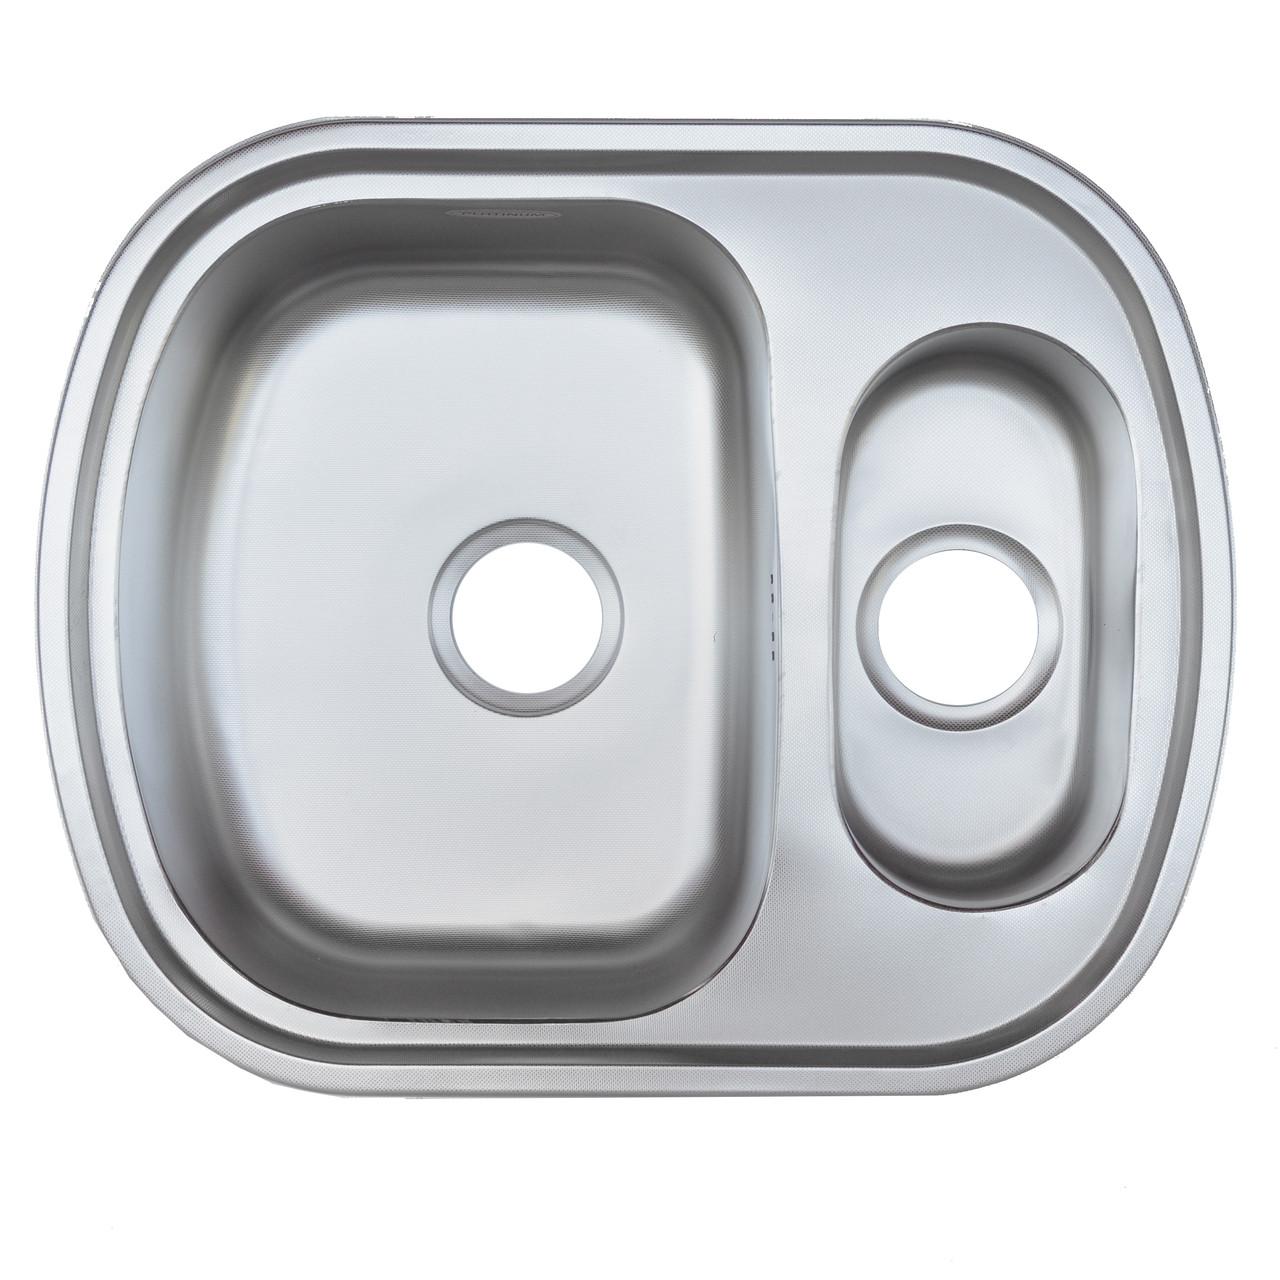 Мийка кухонна Platinum 6349D Decor 0,8 мм